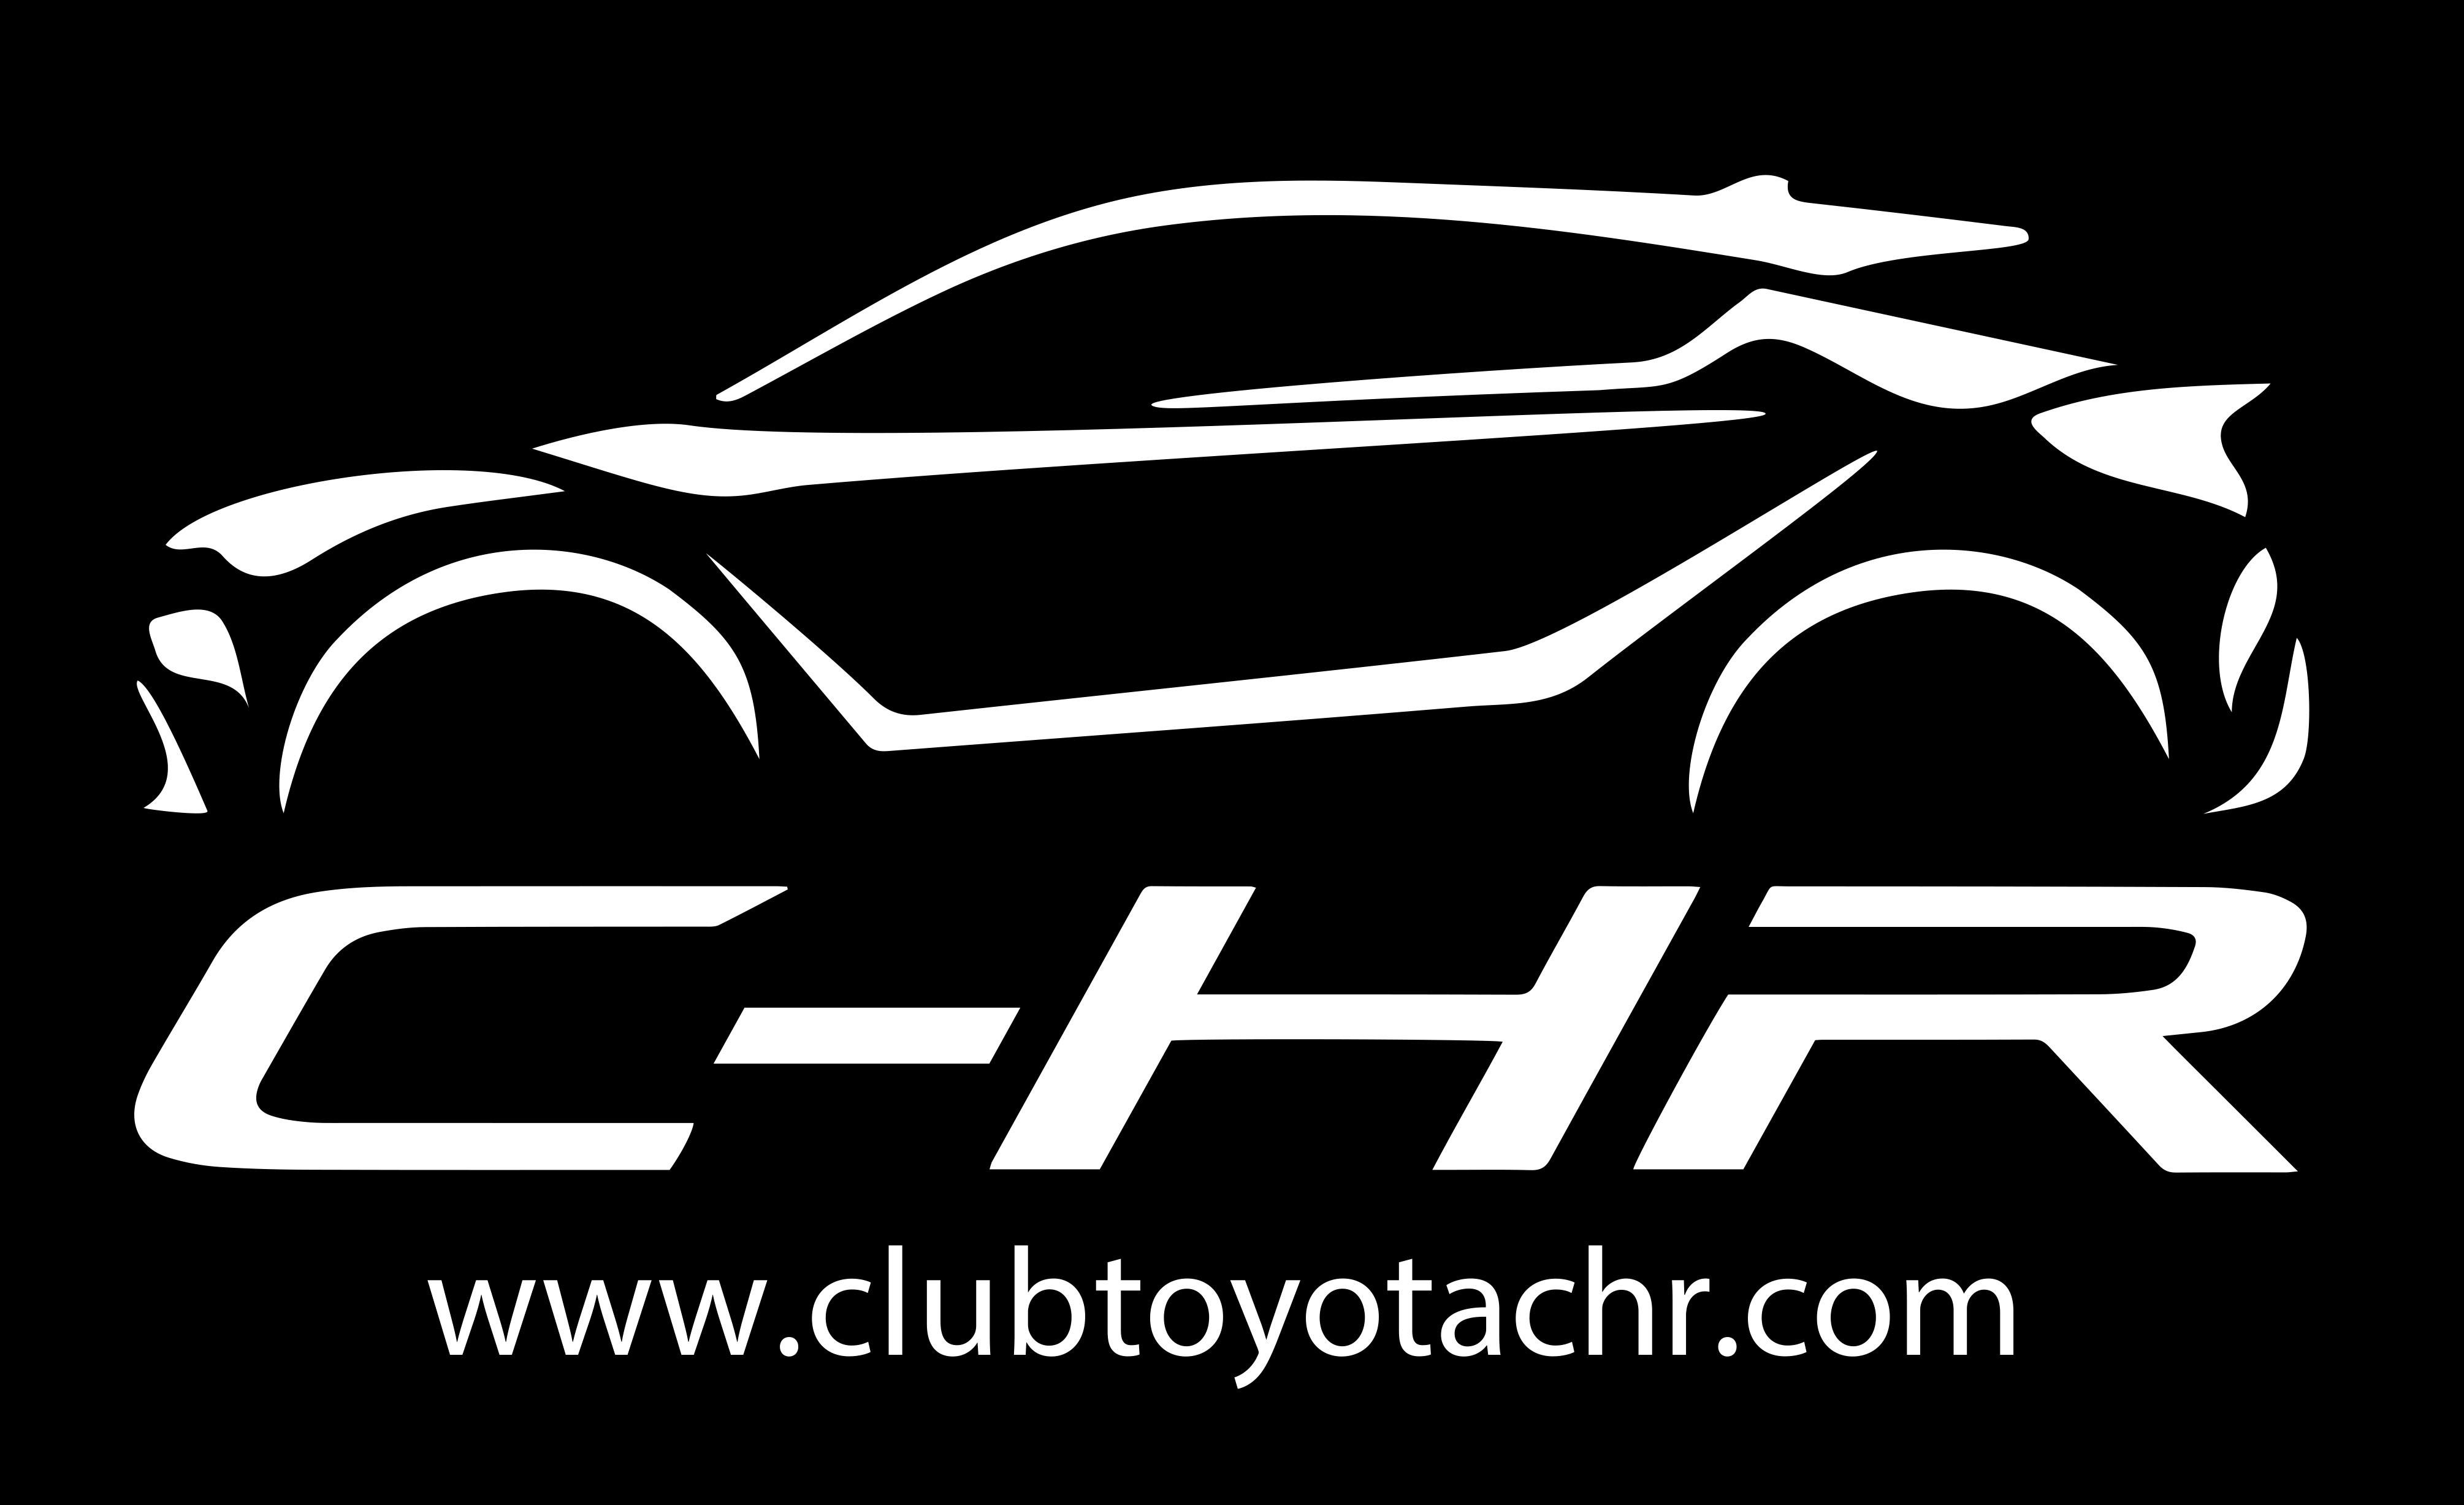 Club Toyota